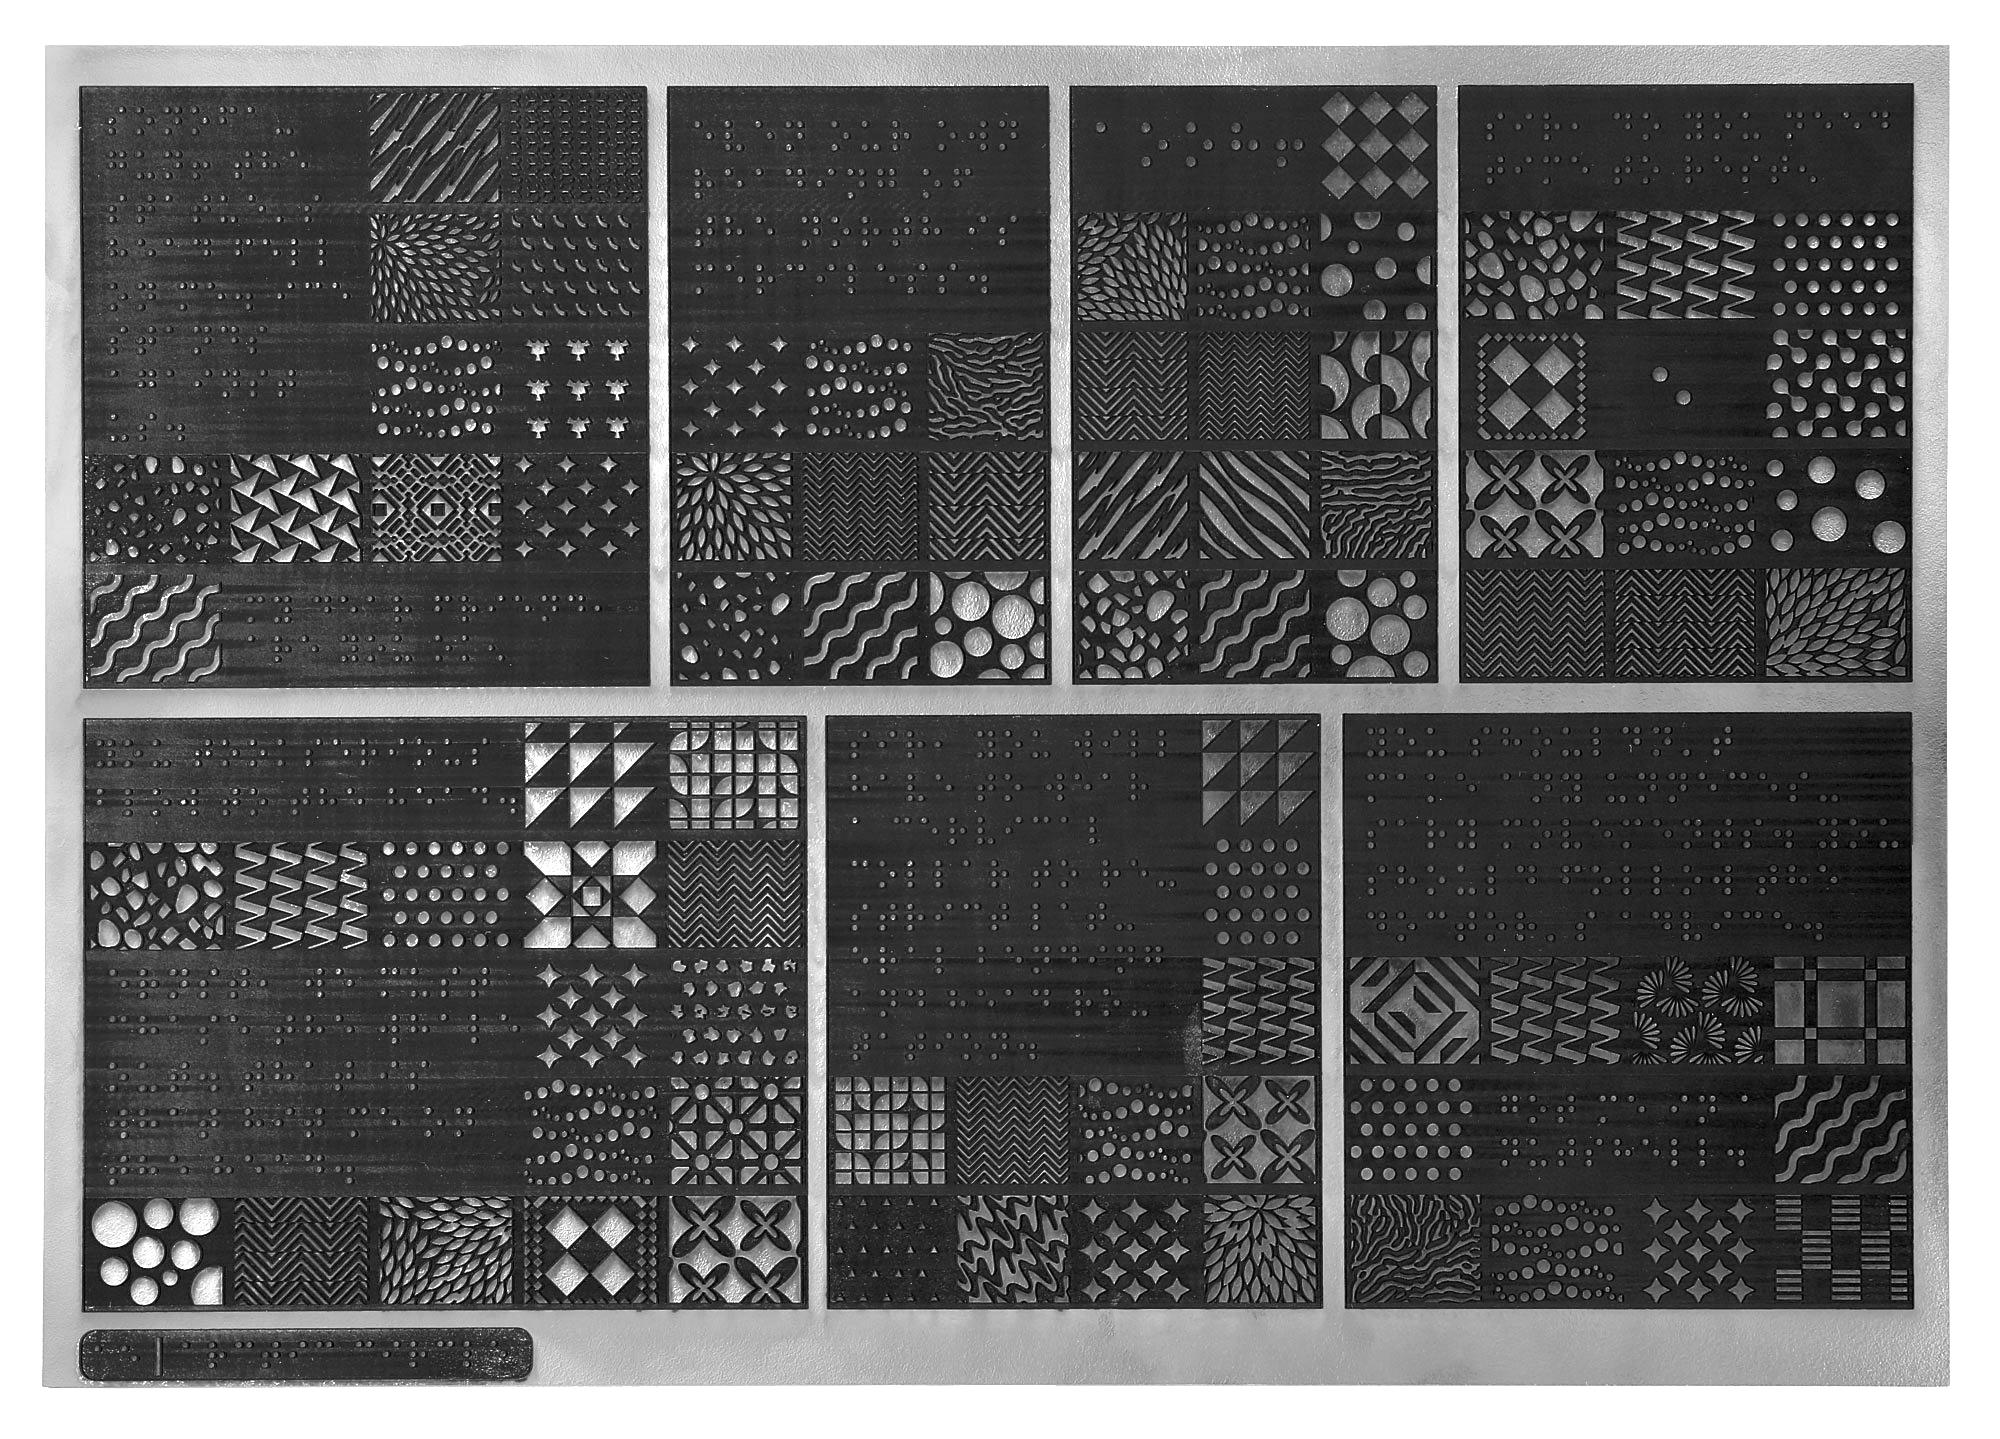 To Arctic Circle είναι χαραγμένο πάνω σε 57 ξύλινες πλάκες διαστάσεων 35x50 εκ., 6 πλάκες υπομνημάτων και χρησιμοποιεί ένα σύνολο από 6.000 patterns. Ζυγίζει γύρω στα 95 κιλά...